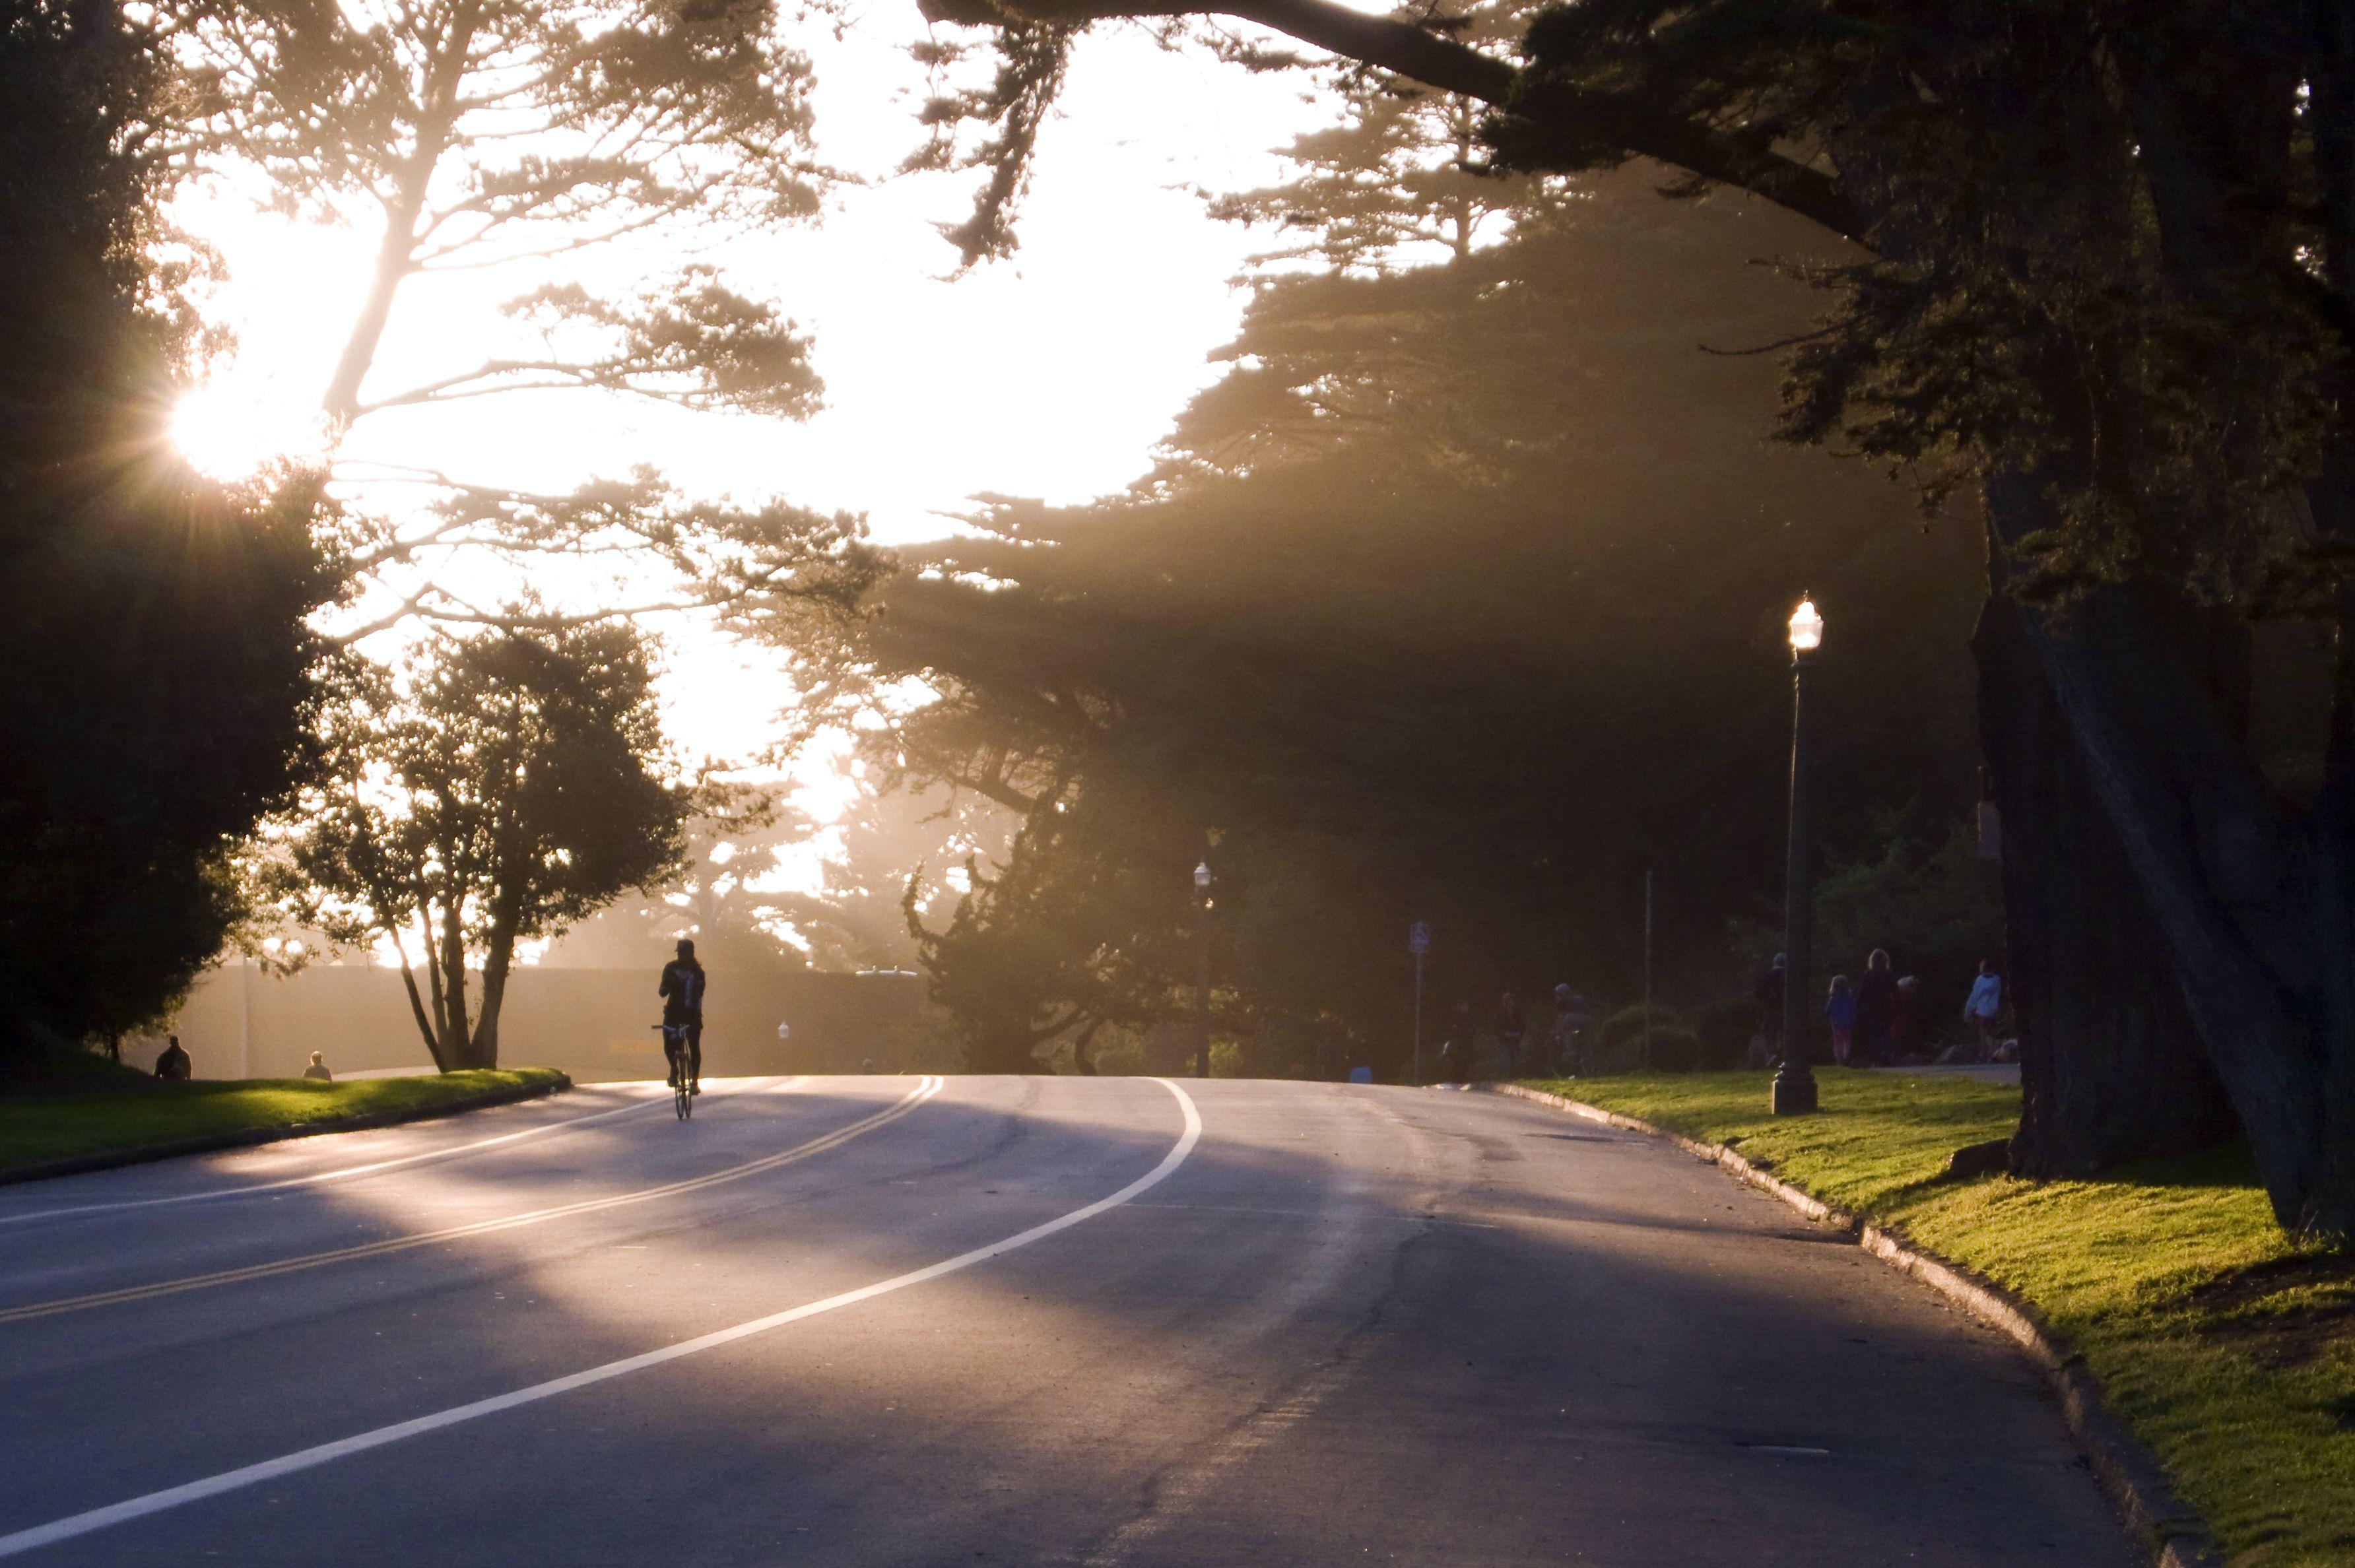 Bike Paths Near Me - Best Bike Routes to Ride